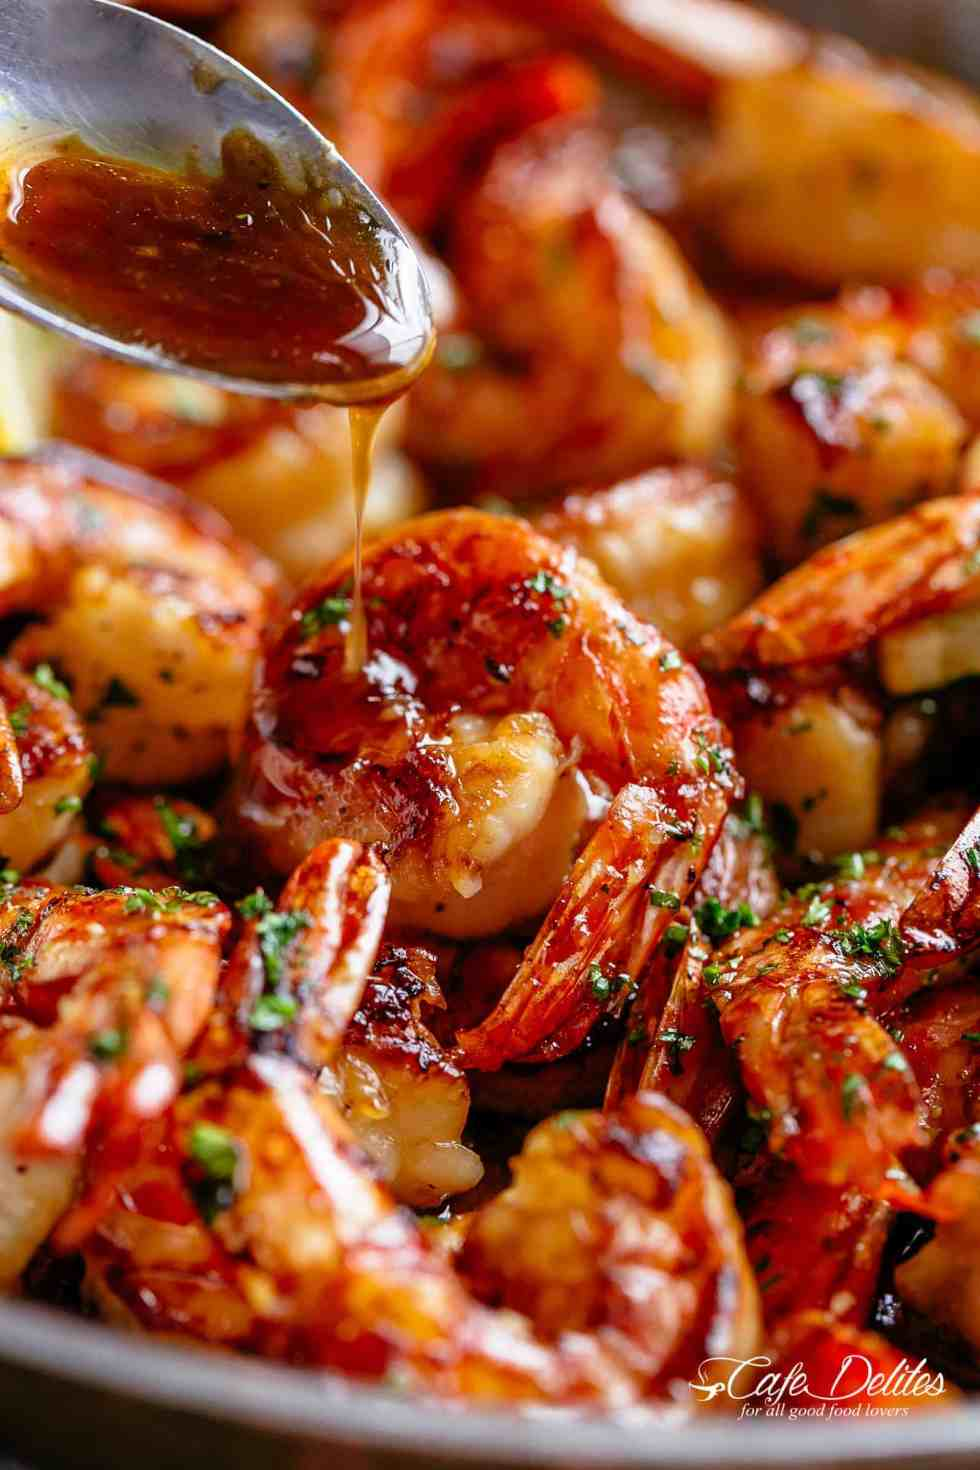 Pouring sauce on shrimp | cafedelites.com